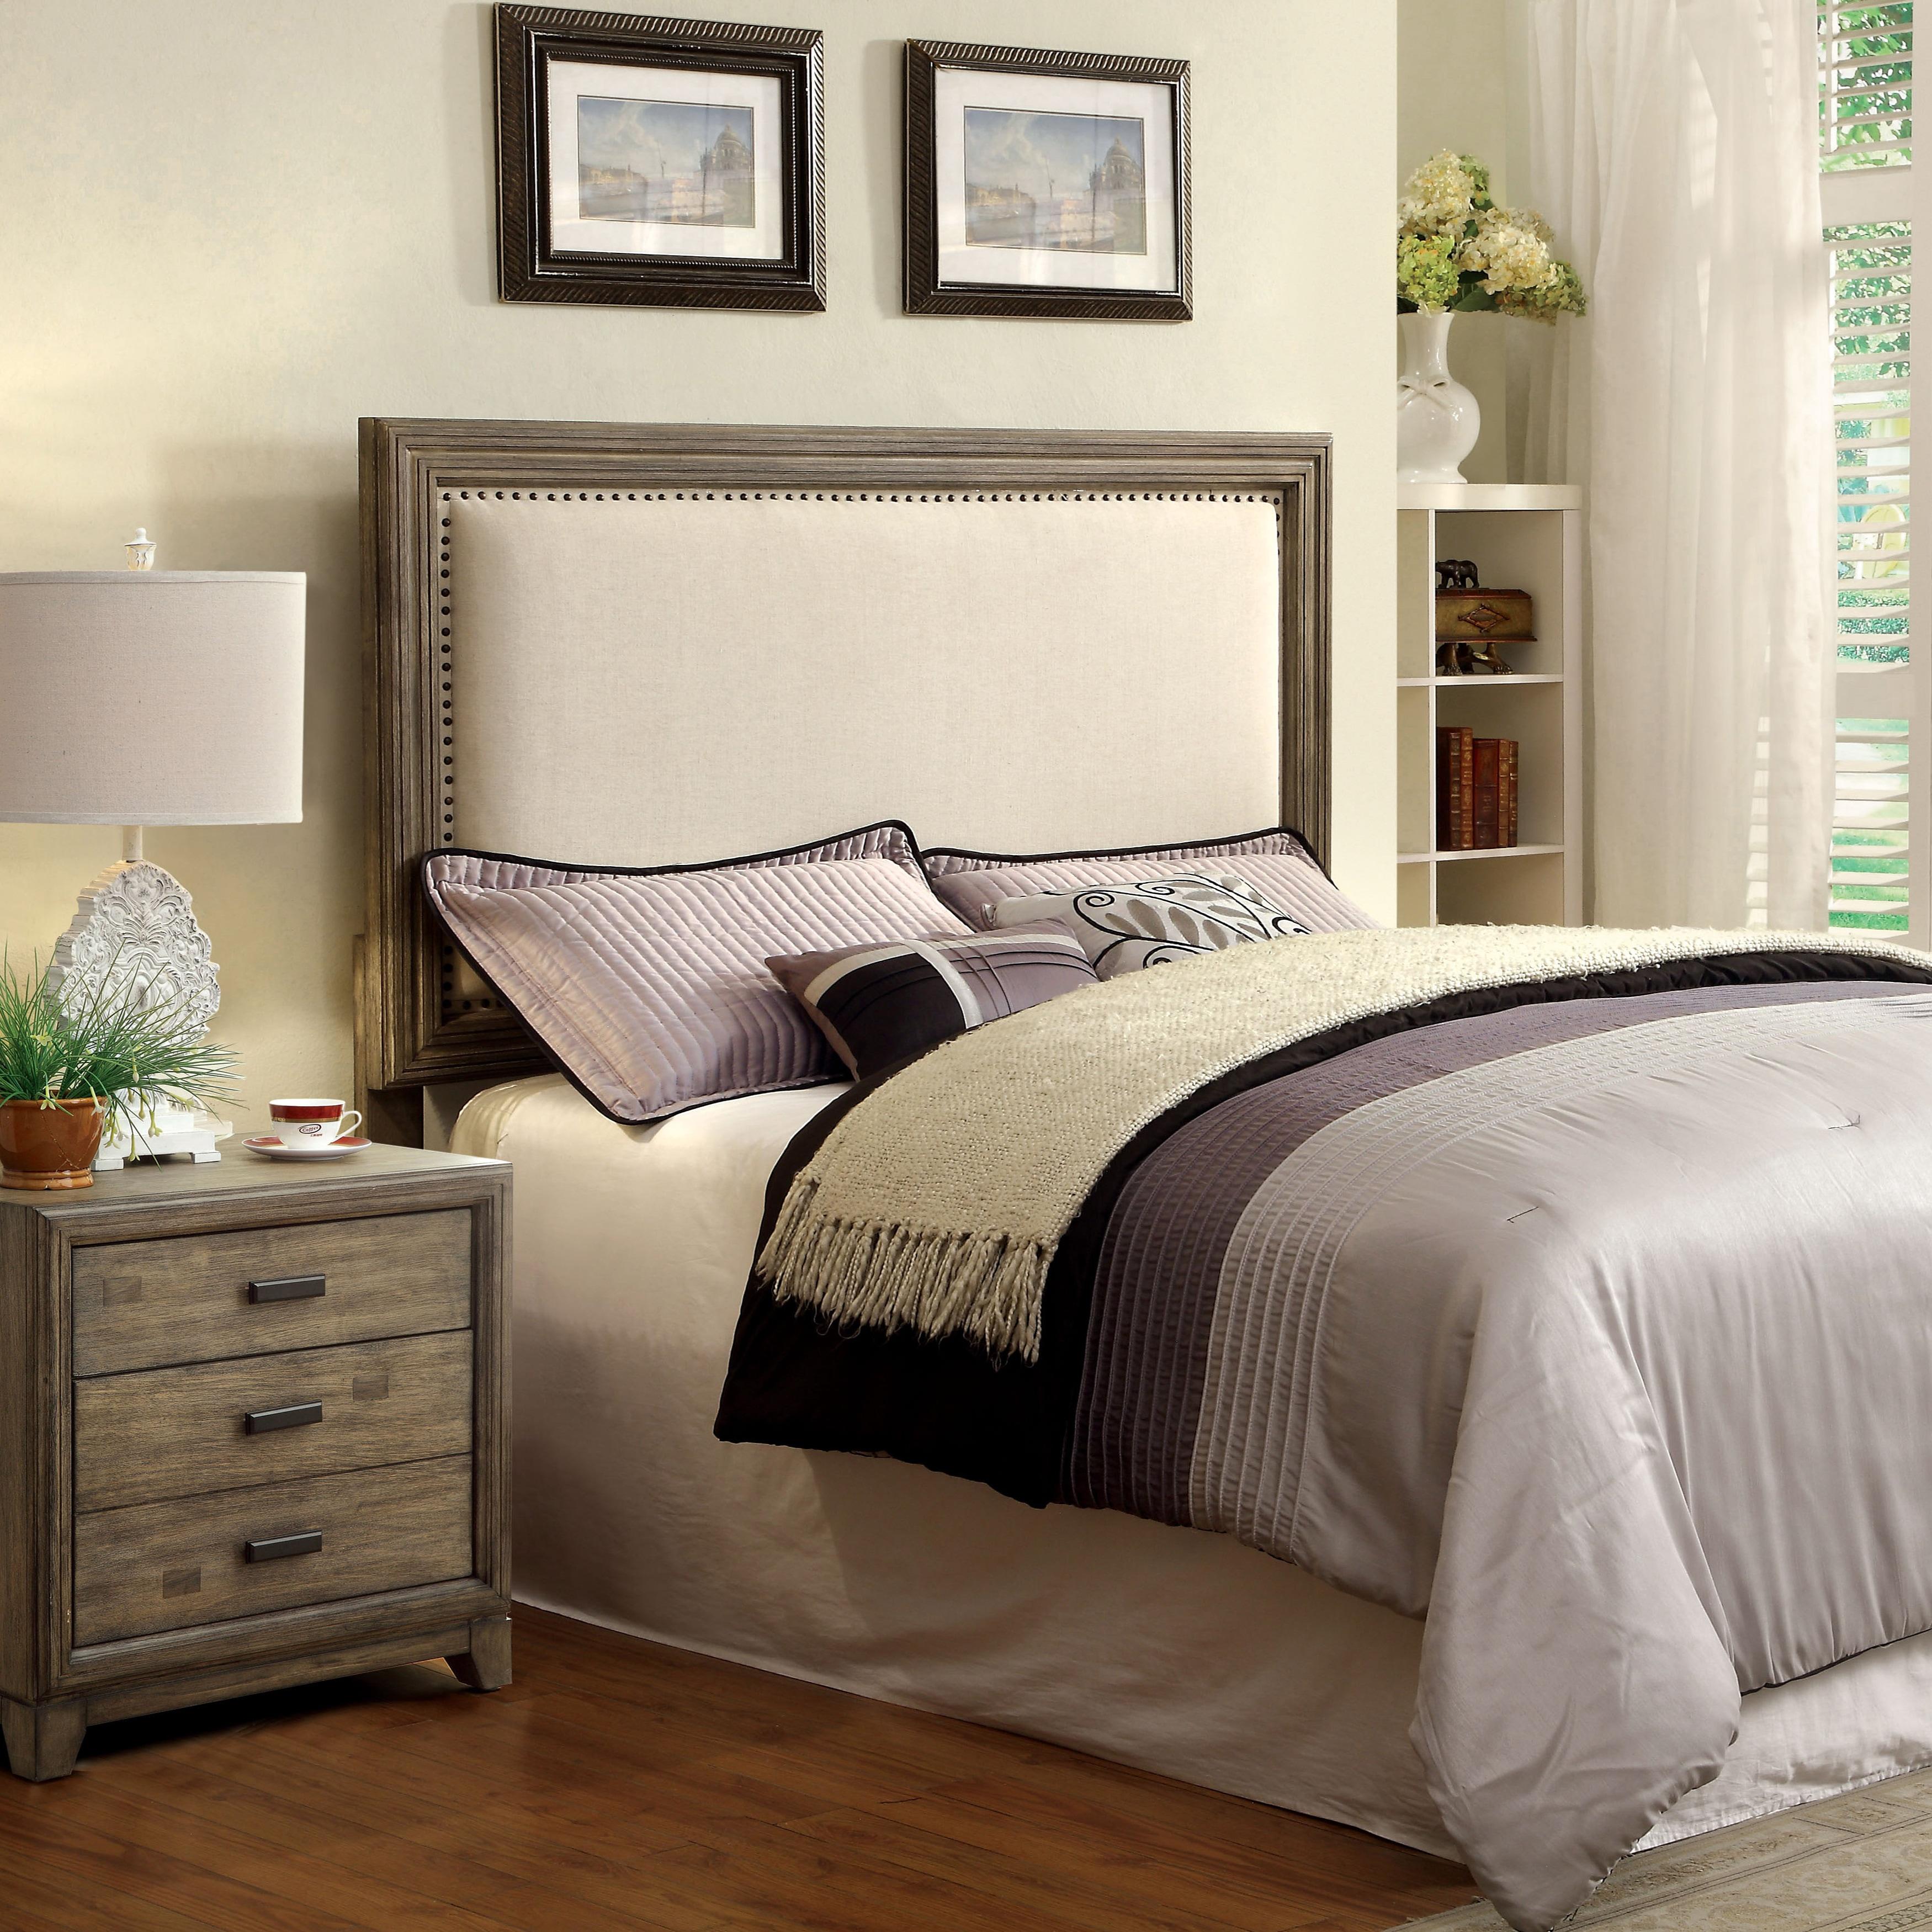 Furniture of America Arian Rustic Grey Upholstered Headbo...